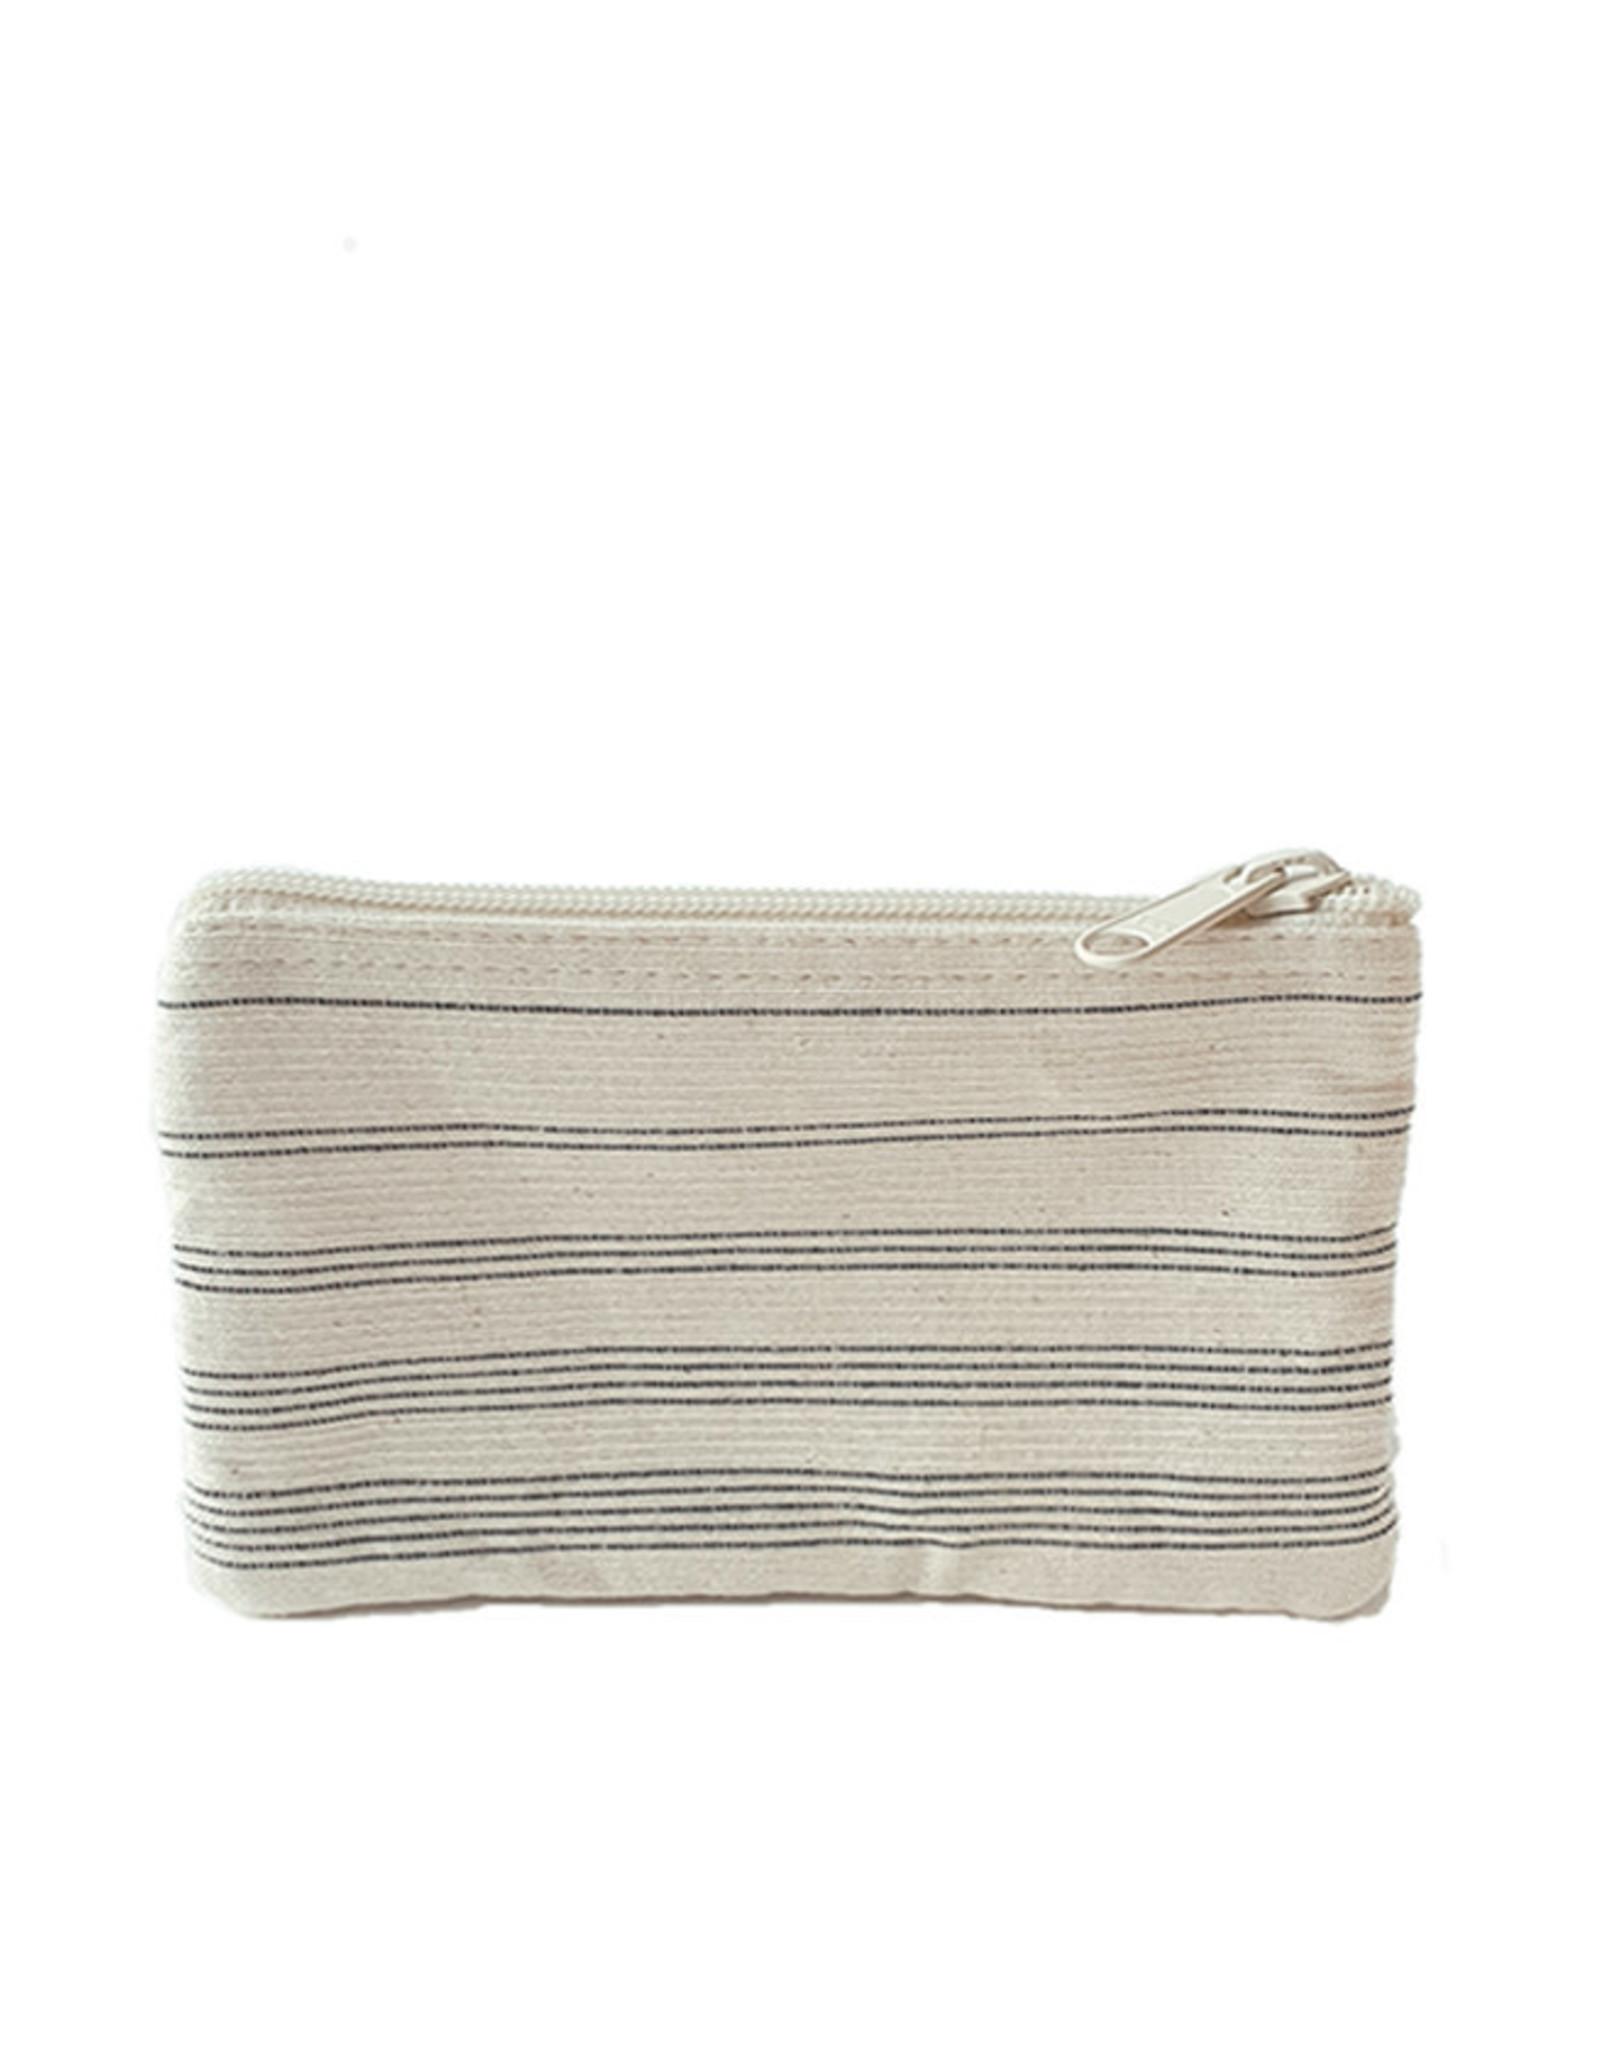 Anna Nera Wallet Shades M 20x12cm-black stripes